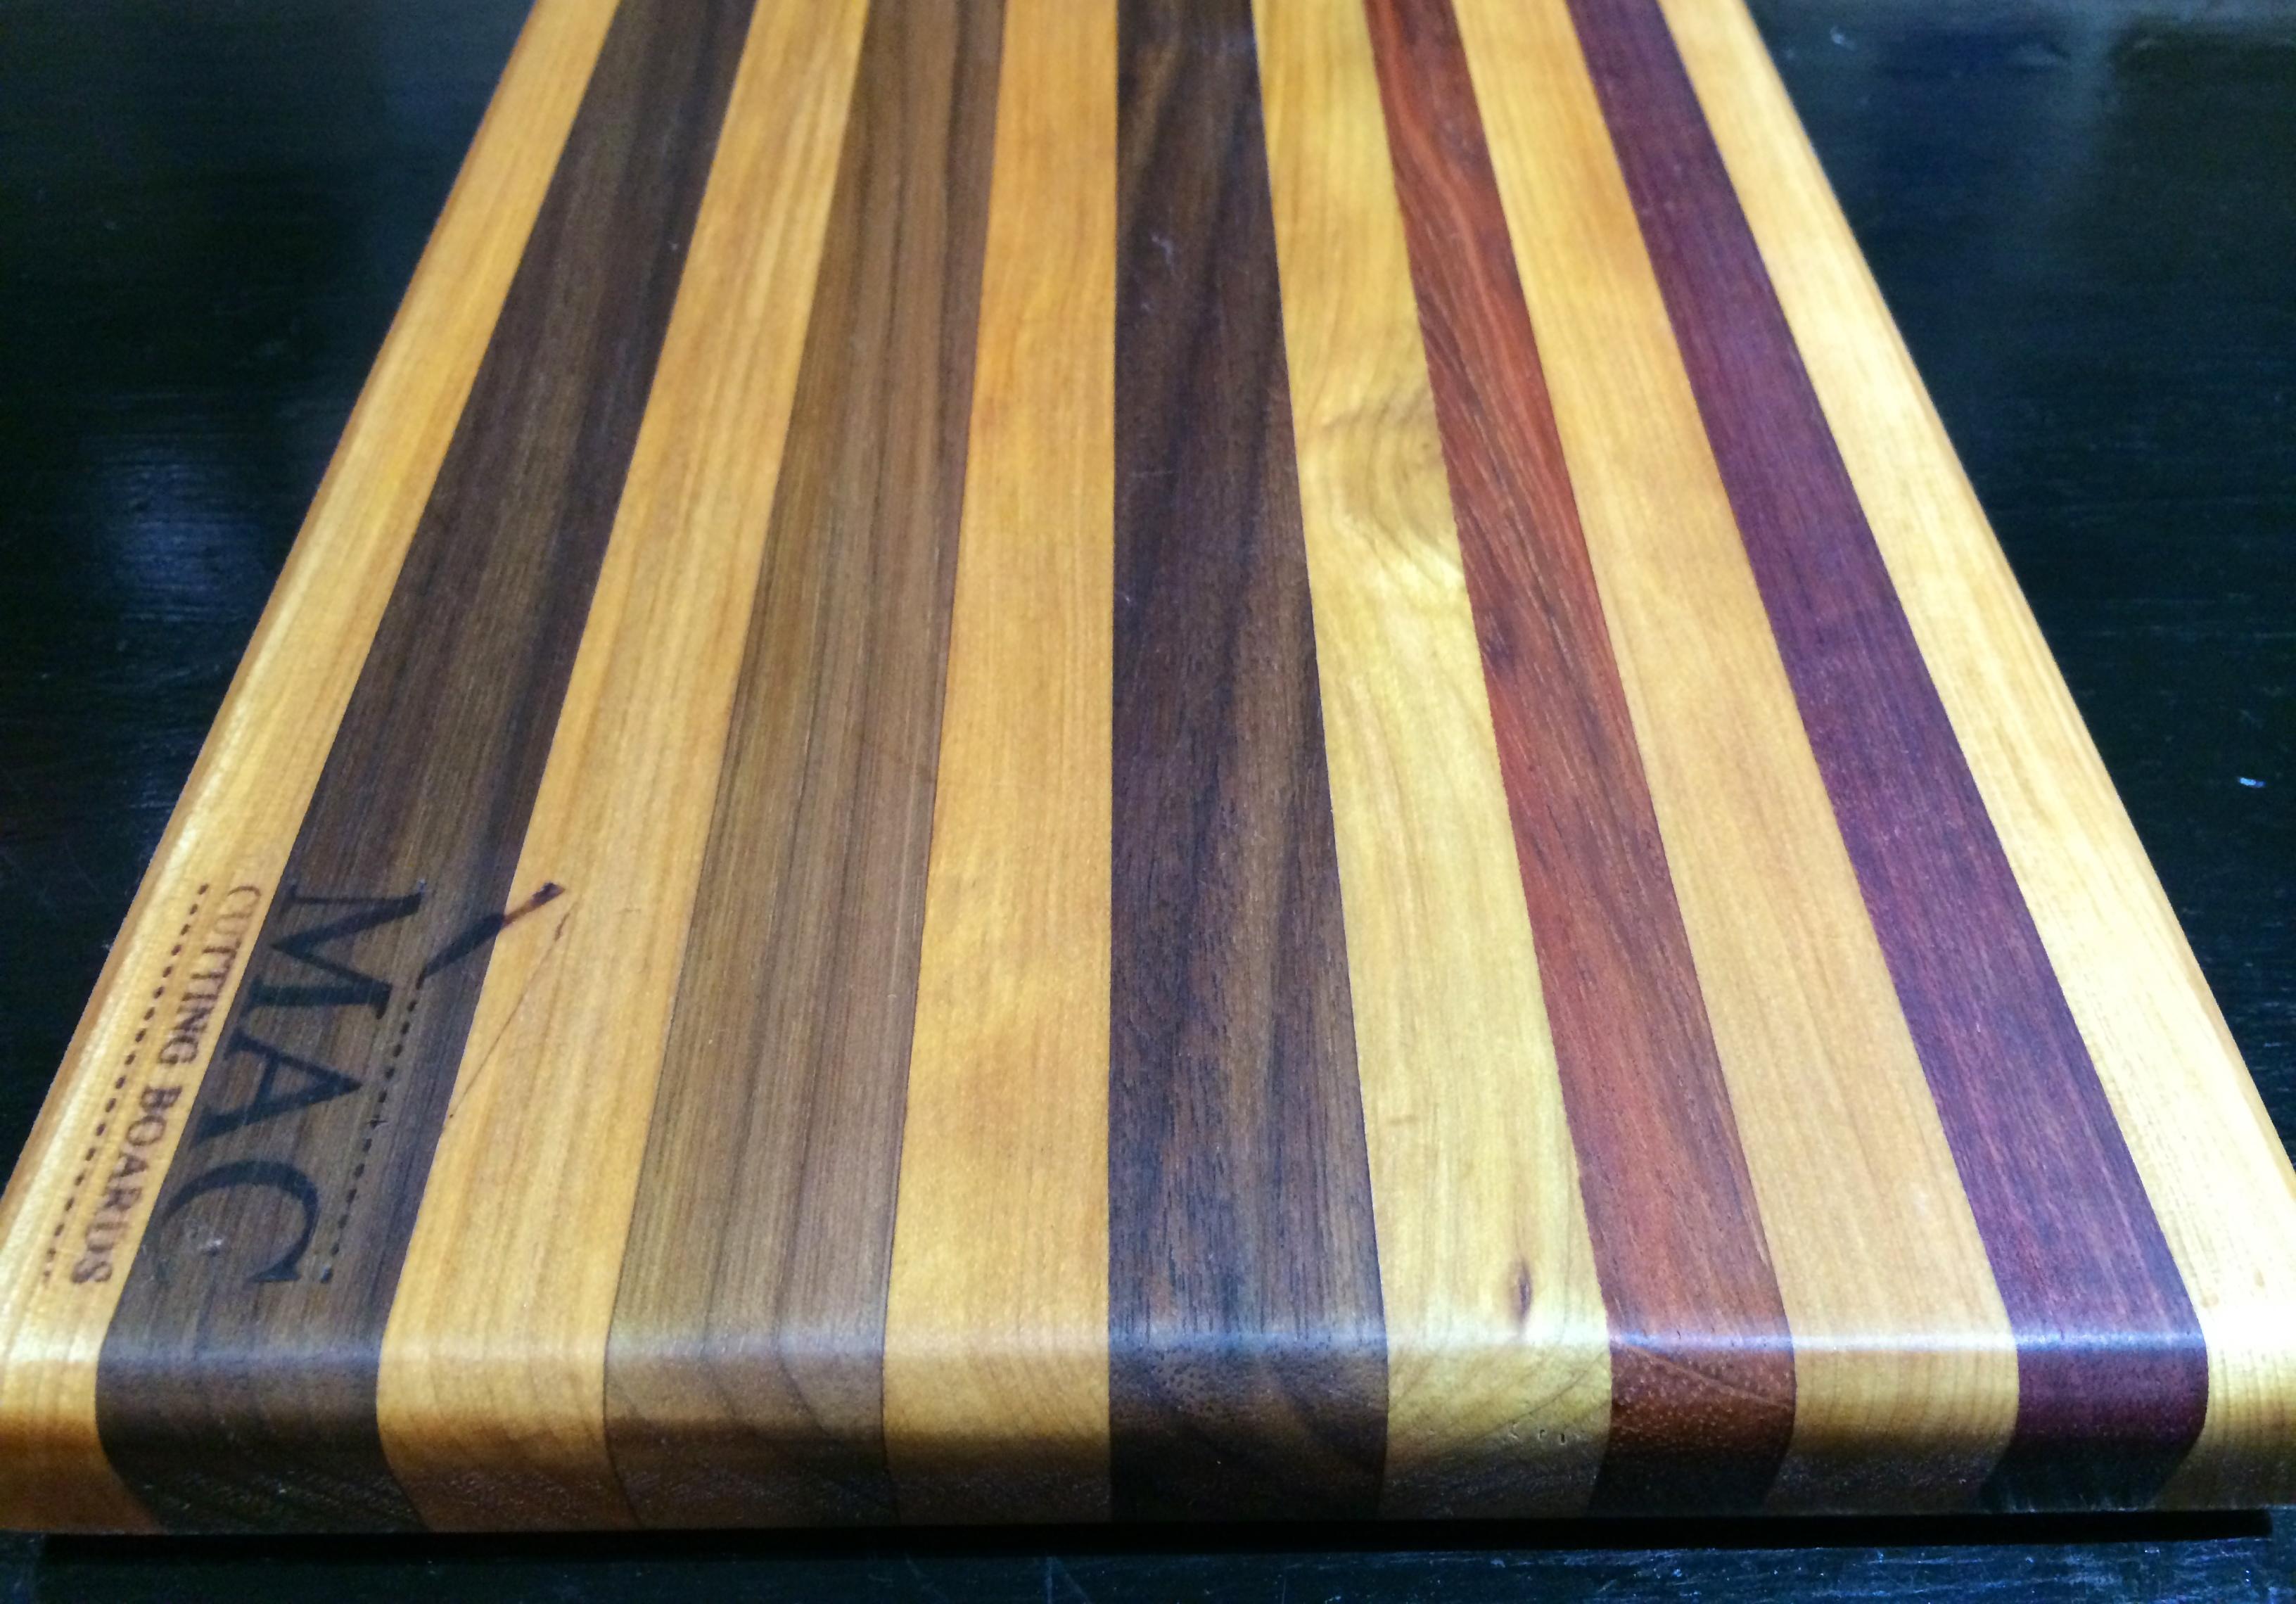 Wood Cutting Board 183 Mac Cutting Boards 183 Online Store